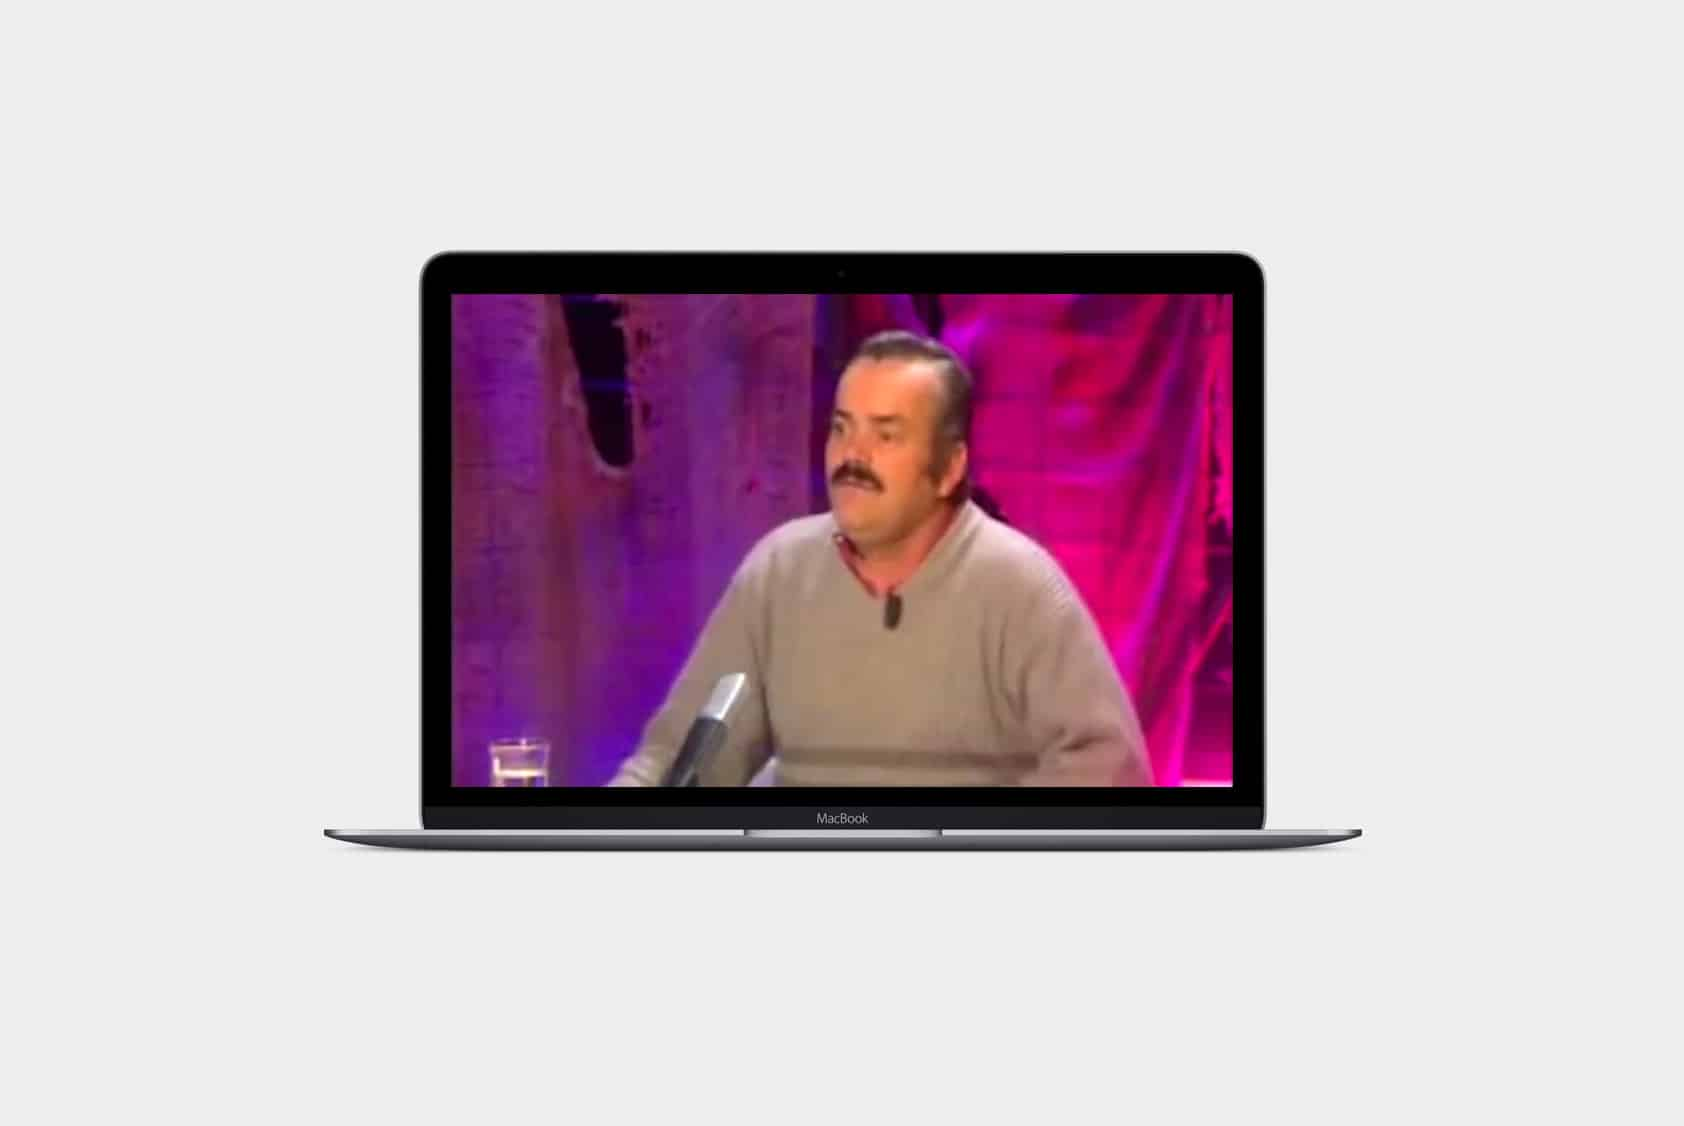 apple-gag-ft ضحكة تقنية : مسخرة ماك بوك 2015